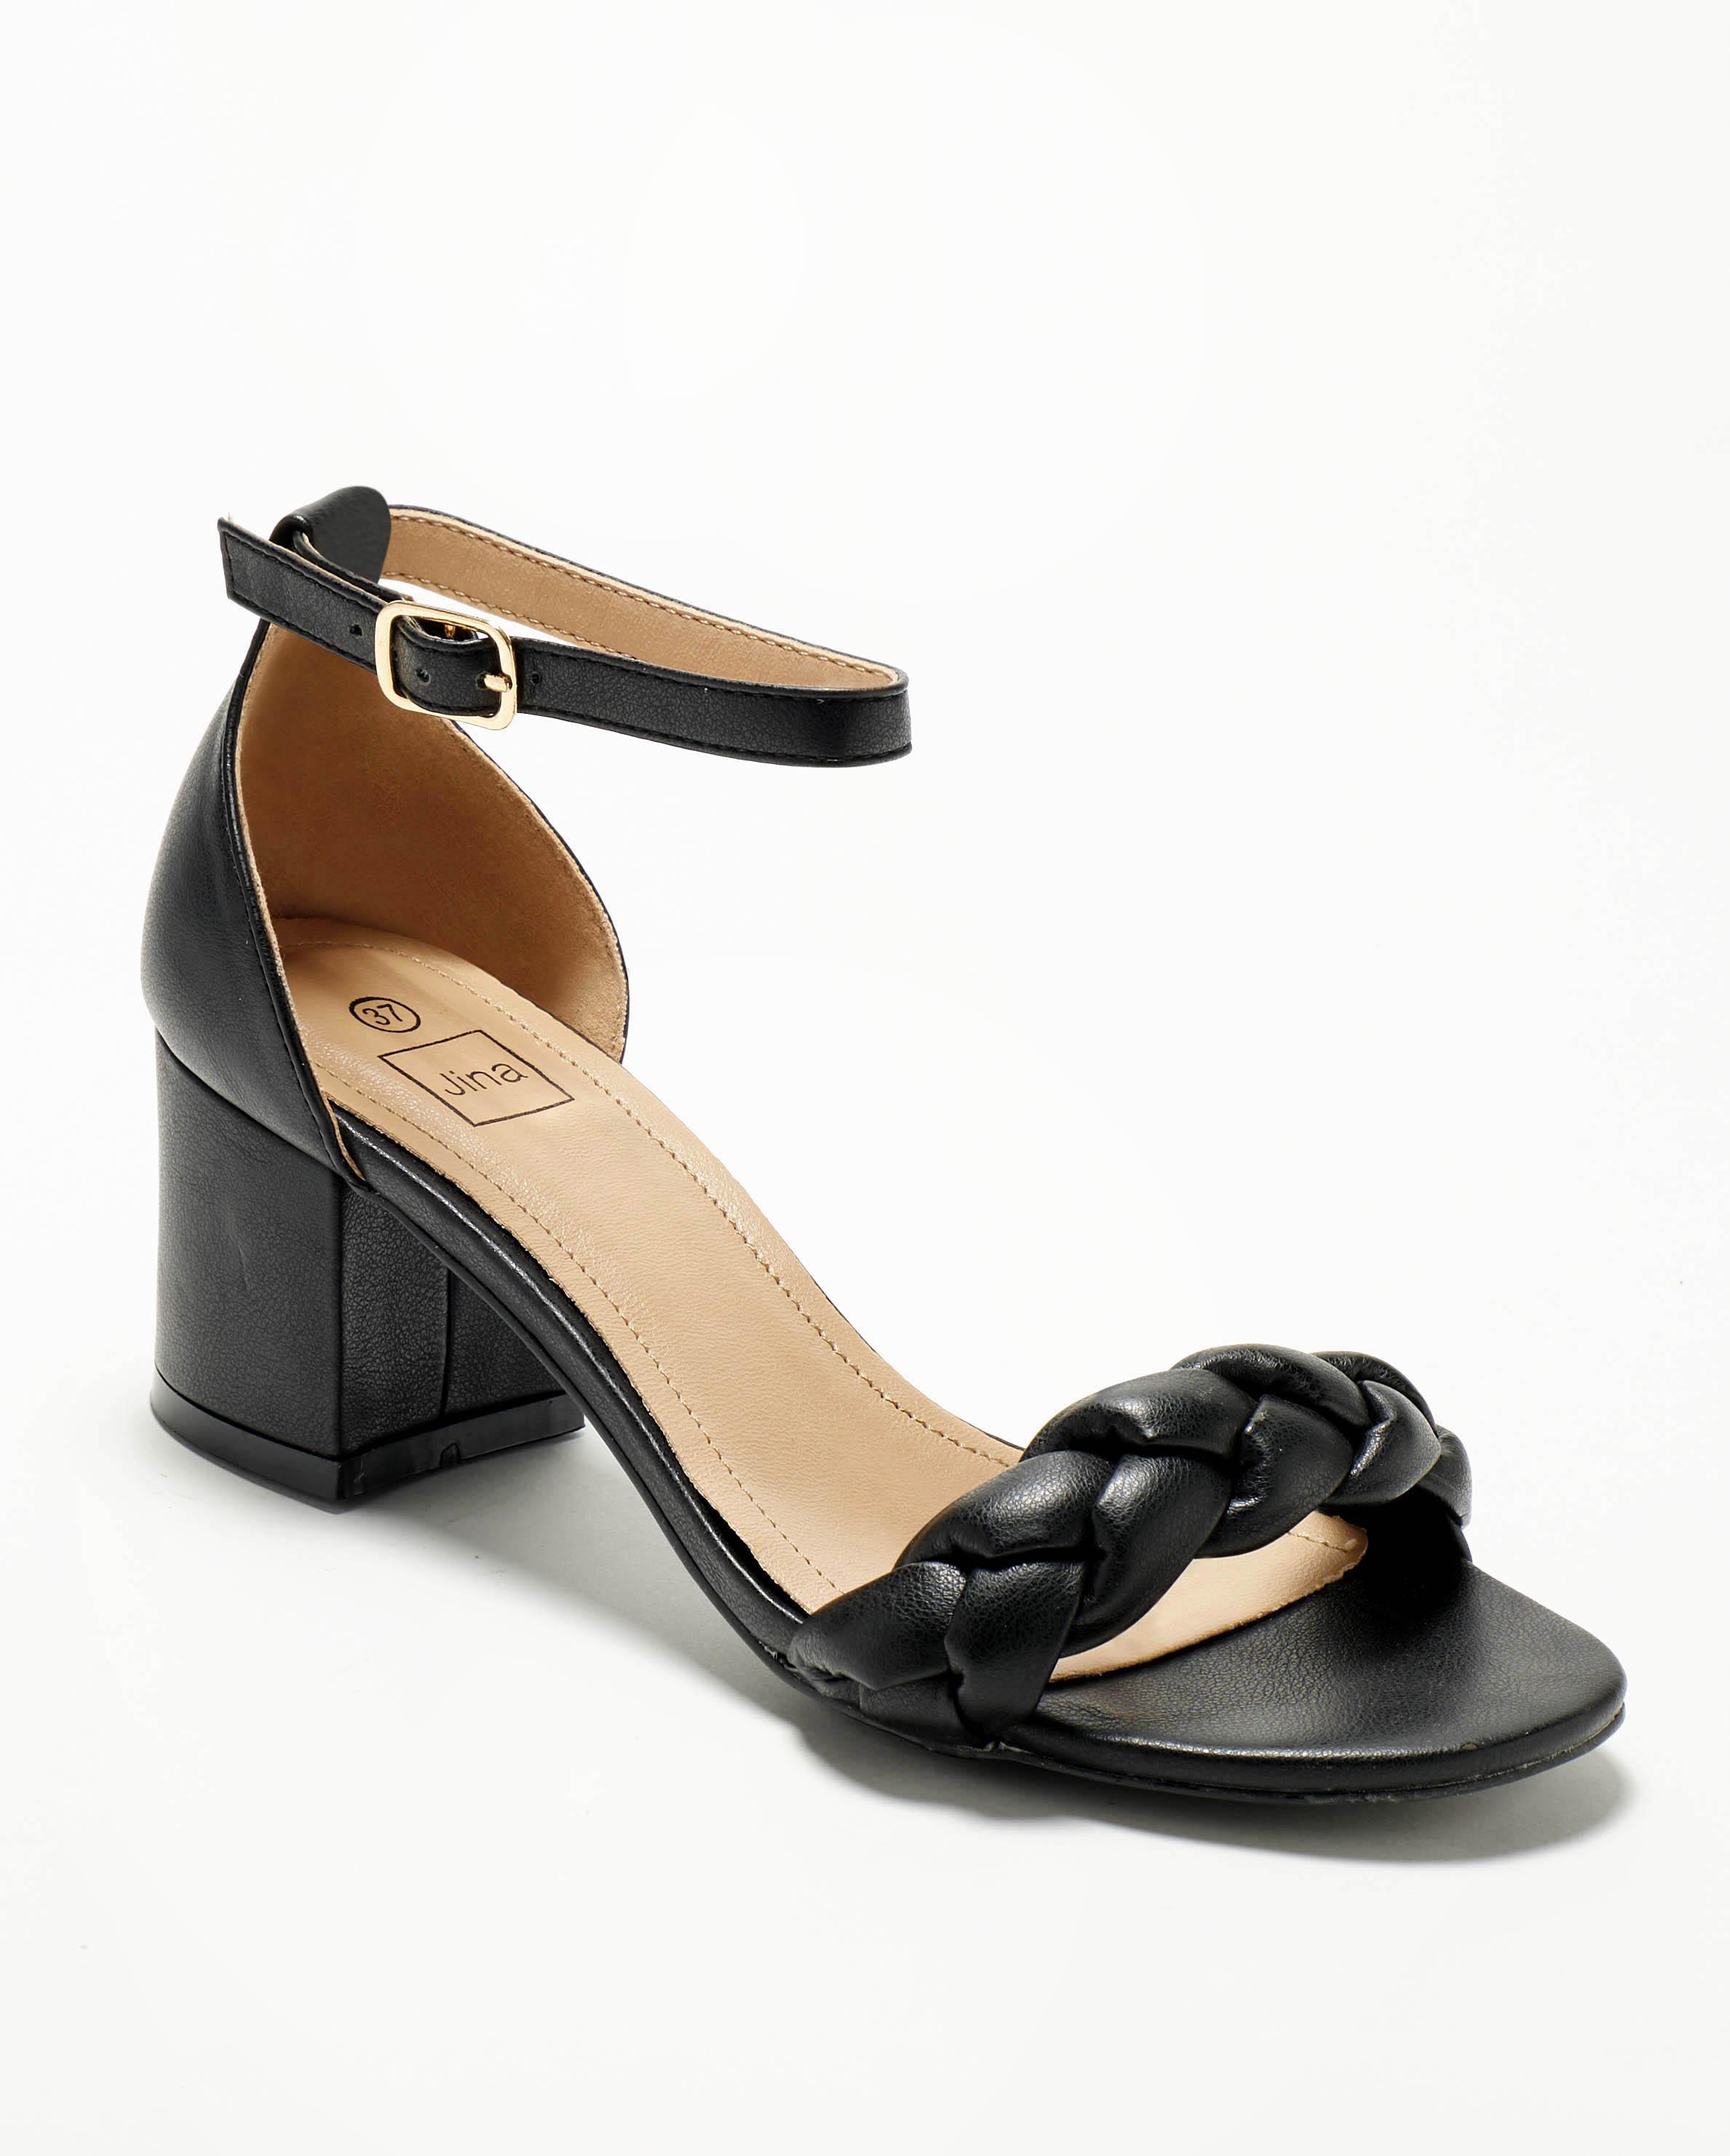 Sandales À Talons Femme - Sandale Talon Decrochee Noir Jina - Lja5139-3a